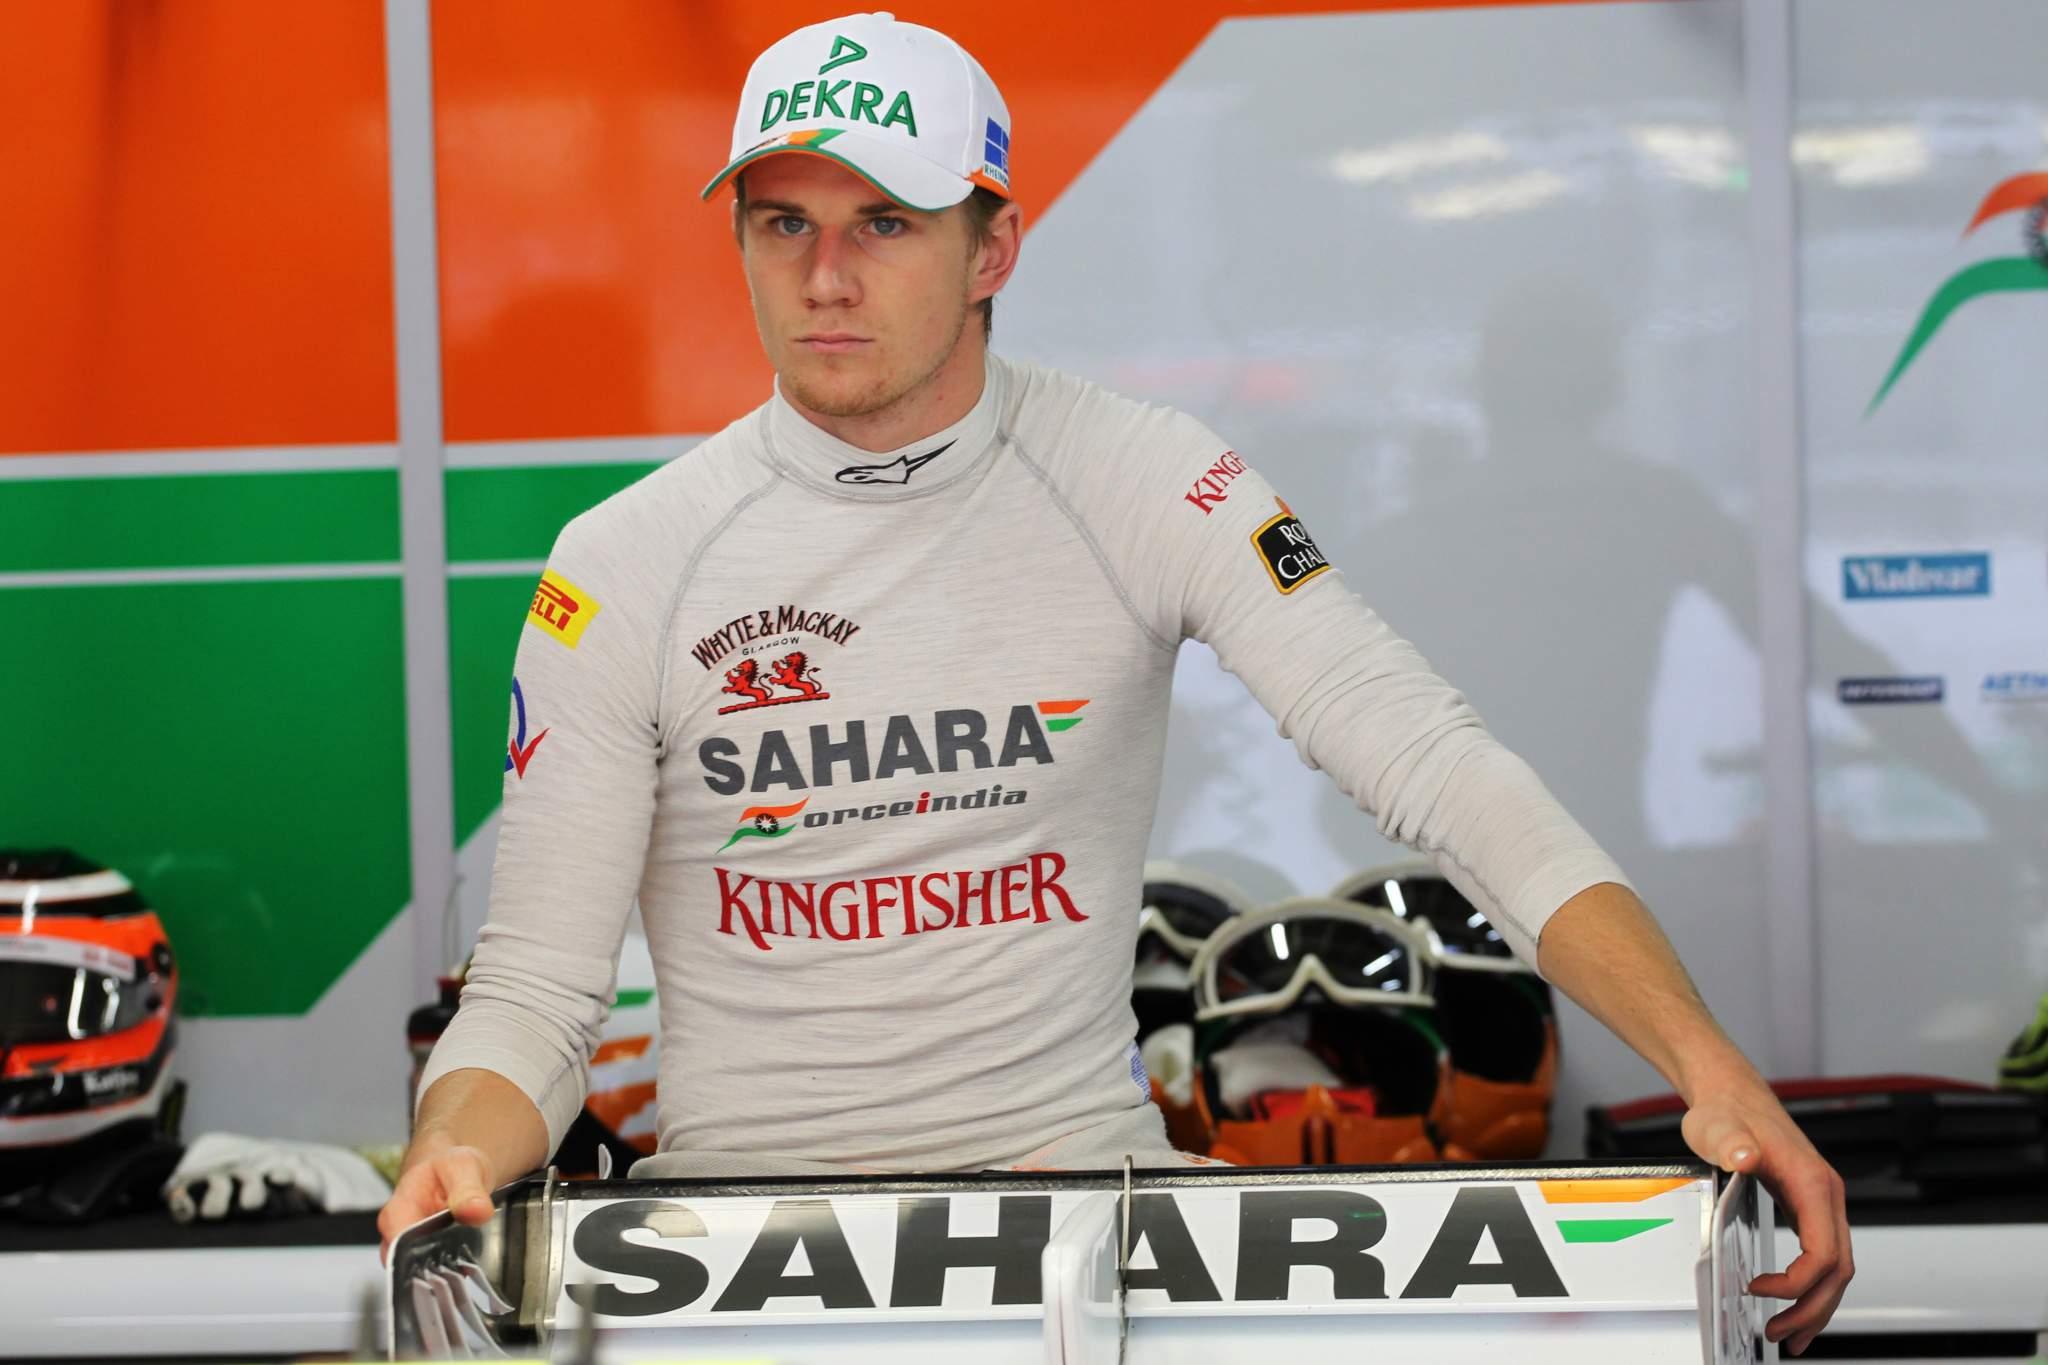 Motor Racing Formula One World Championship Brazilian Grand Prix Race Day Sao Paulo, Brazil